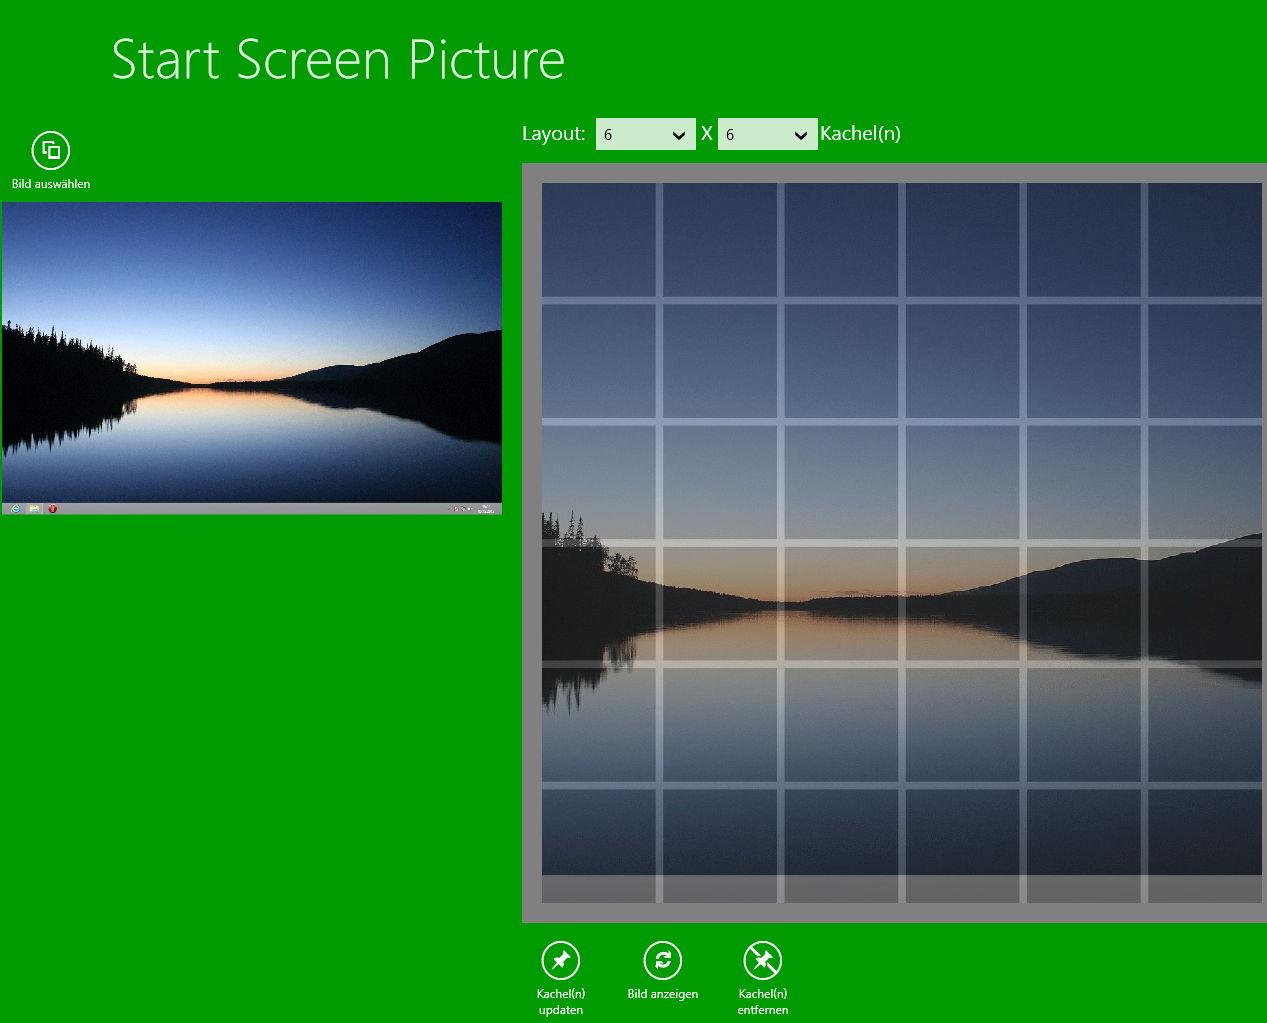 Fotos in mehreren Kacheln darstellen – Windows 8 App